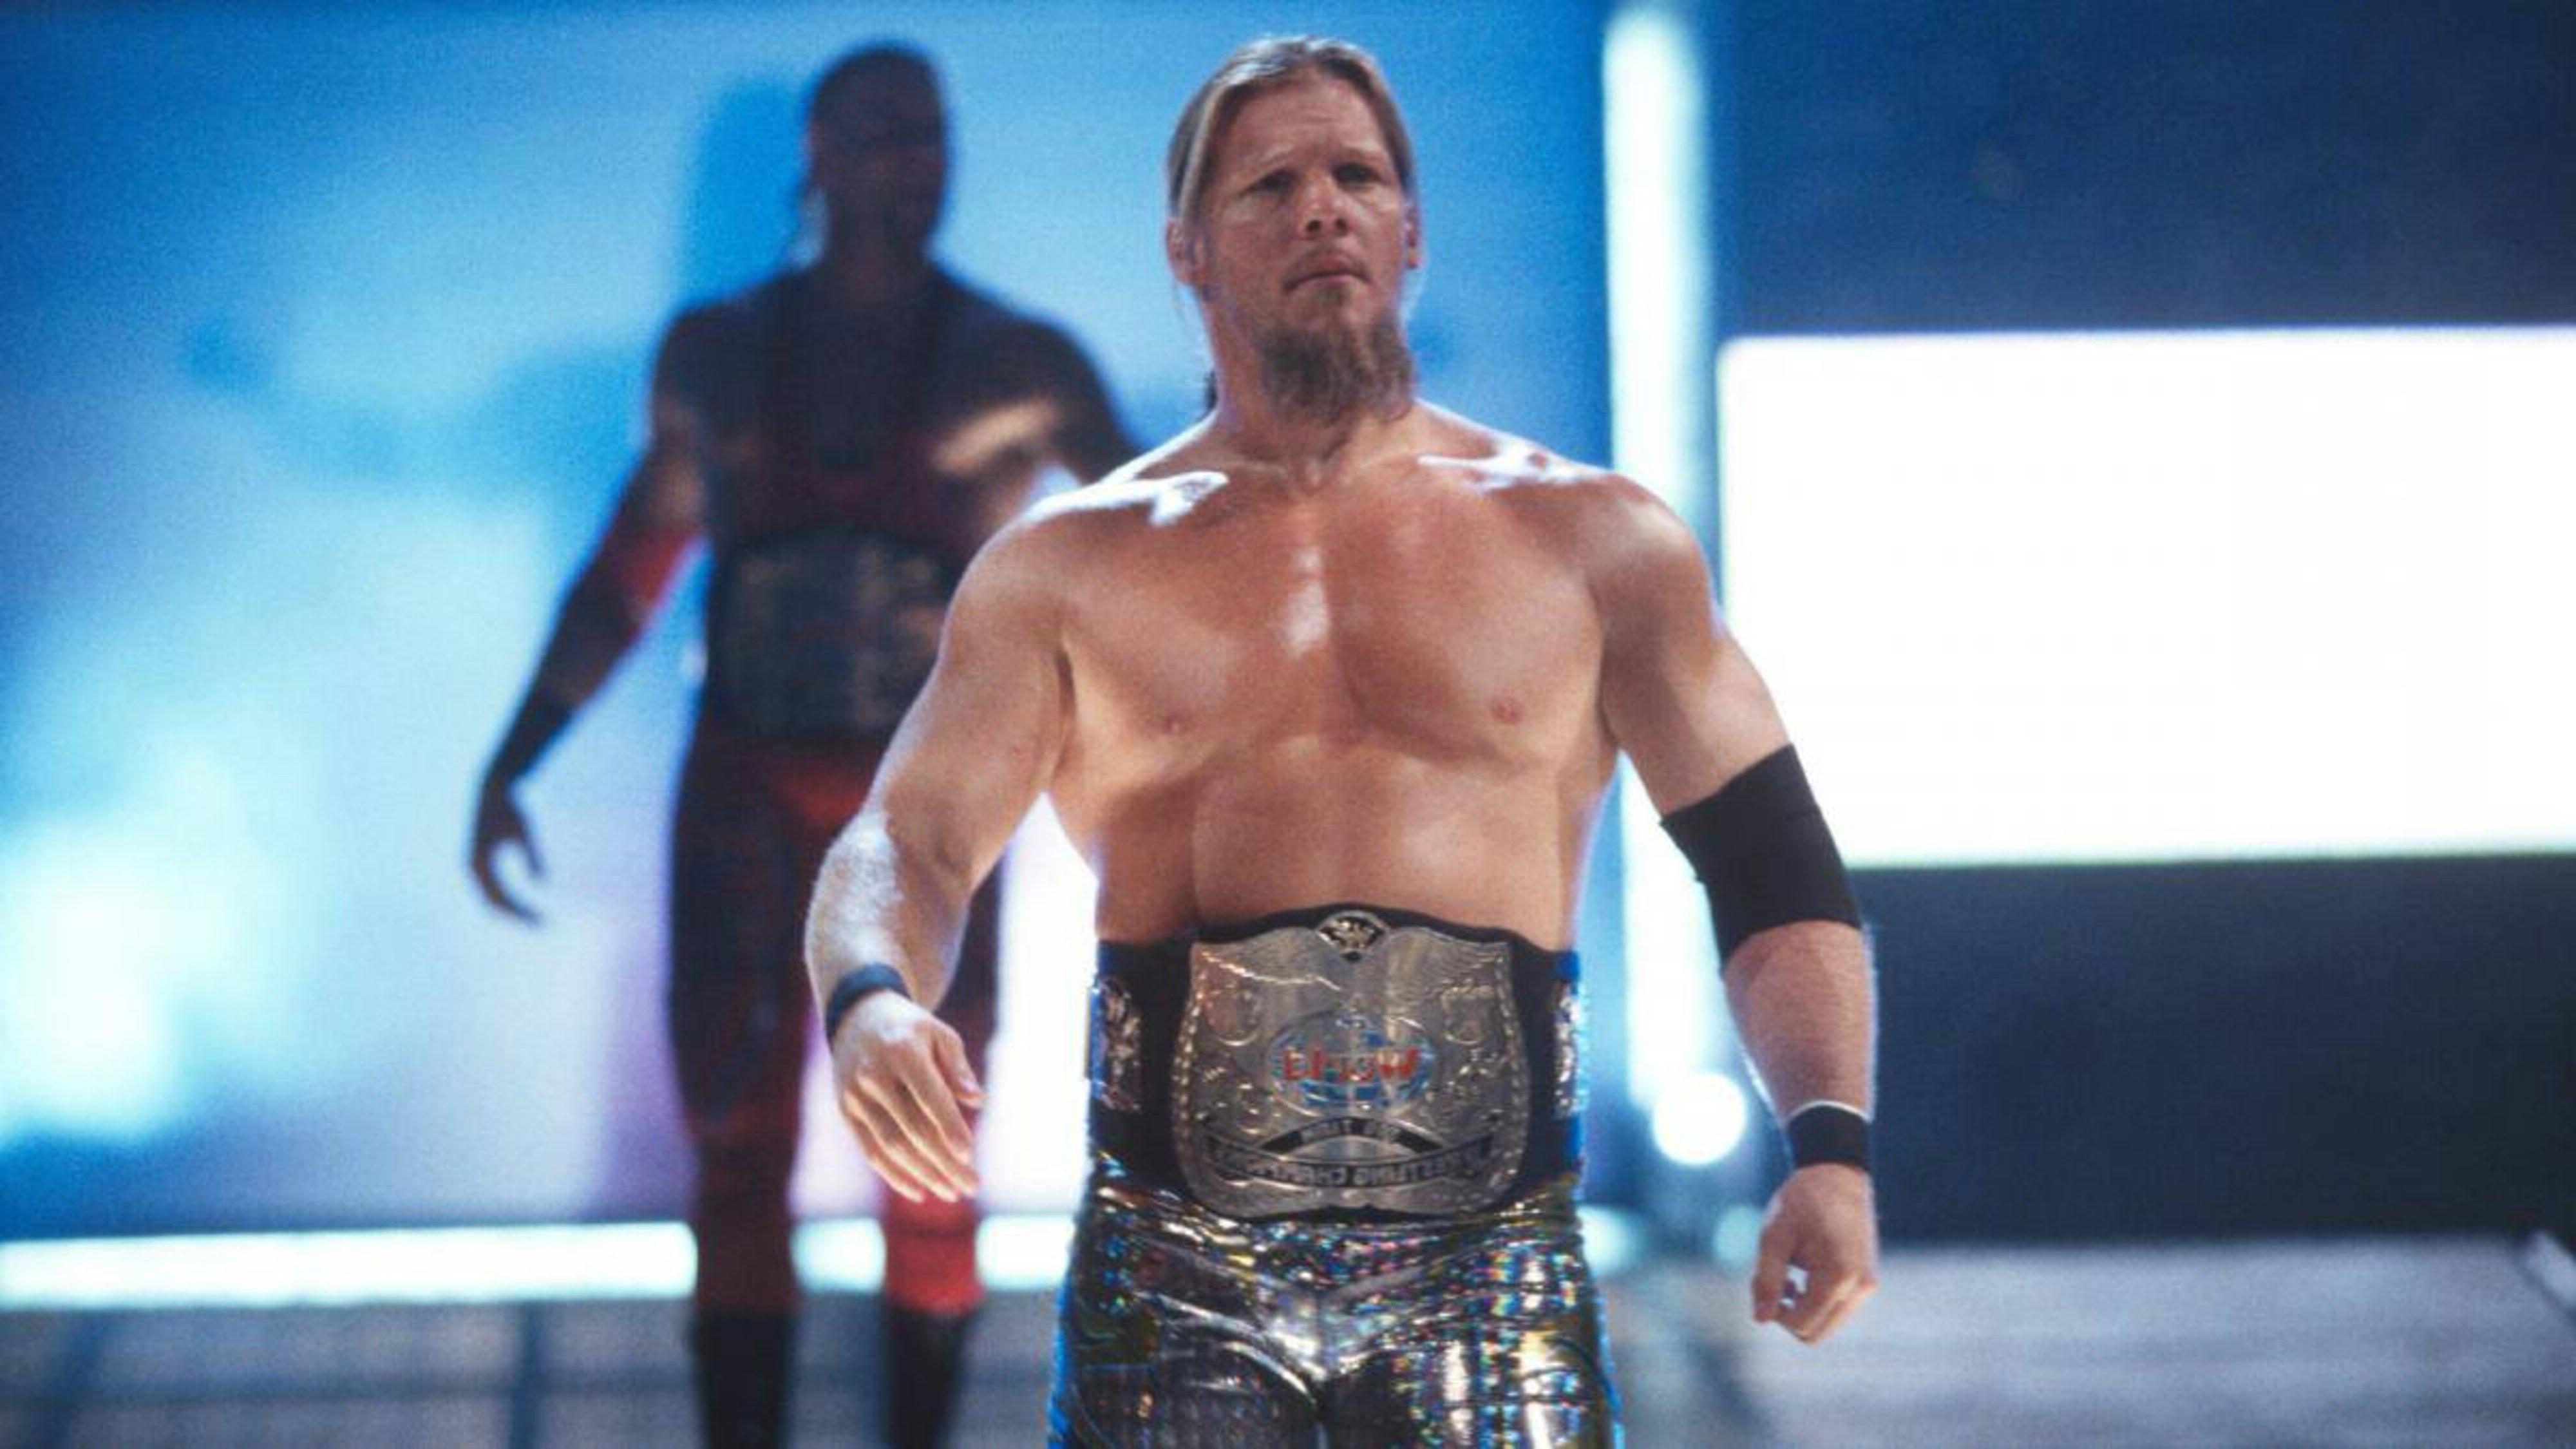 A long beard style of Chris Jericho.